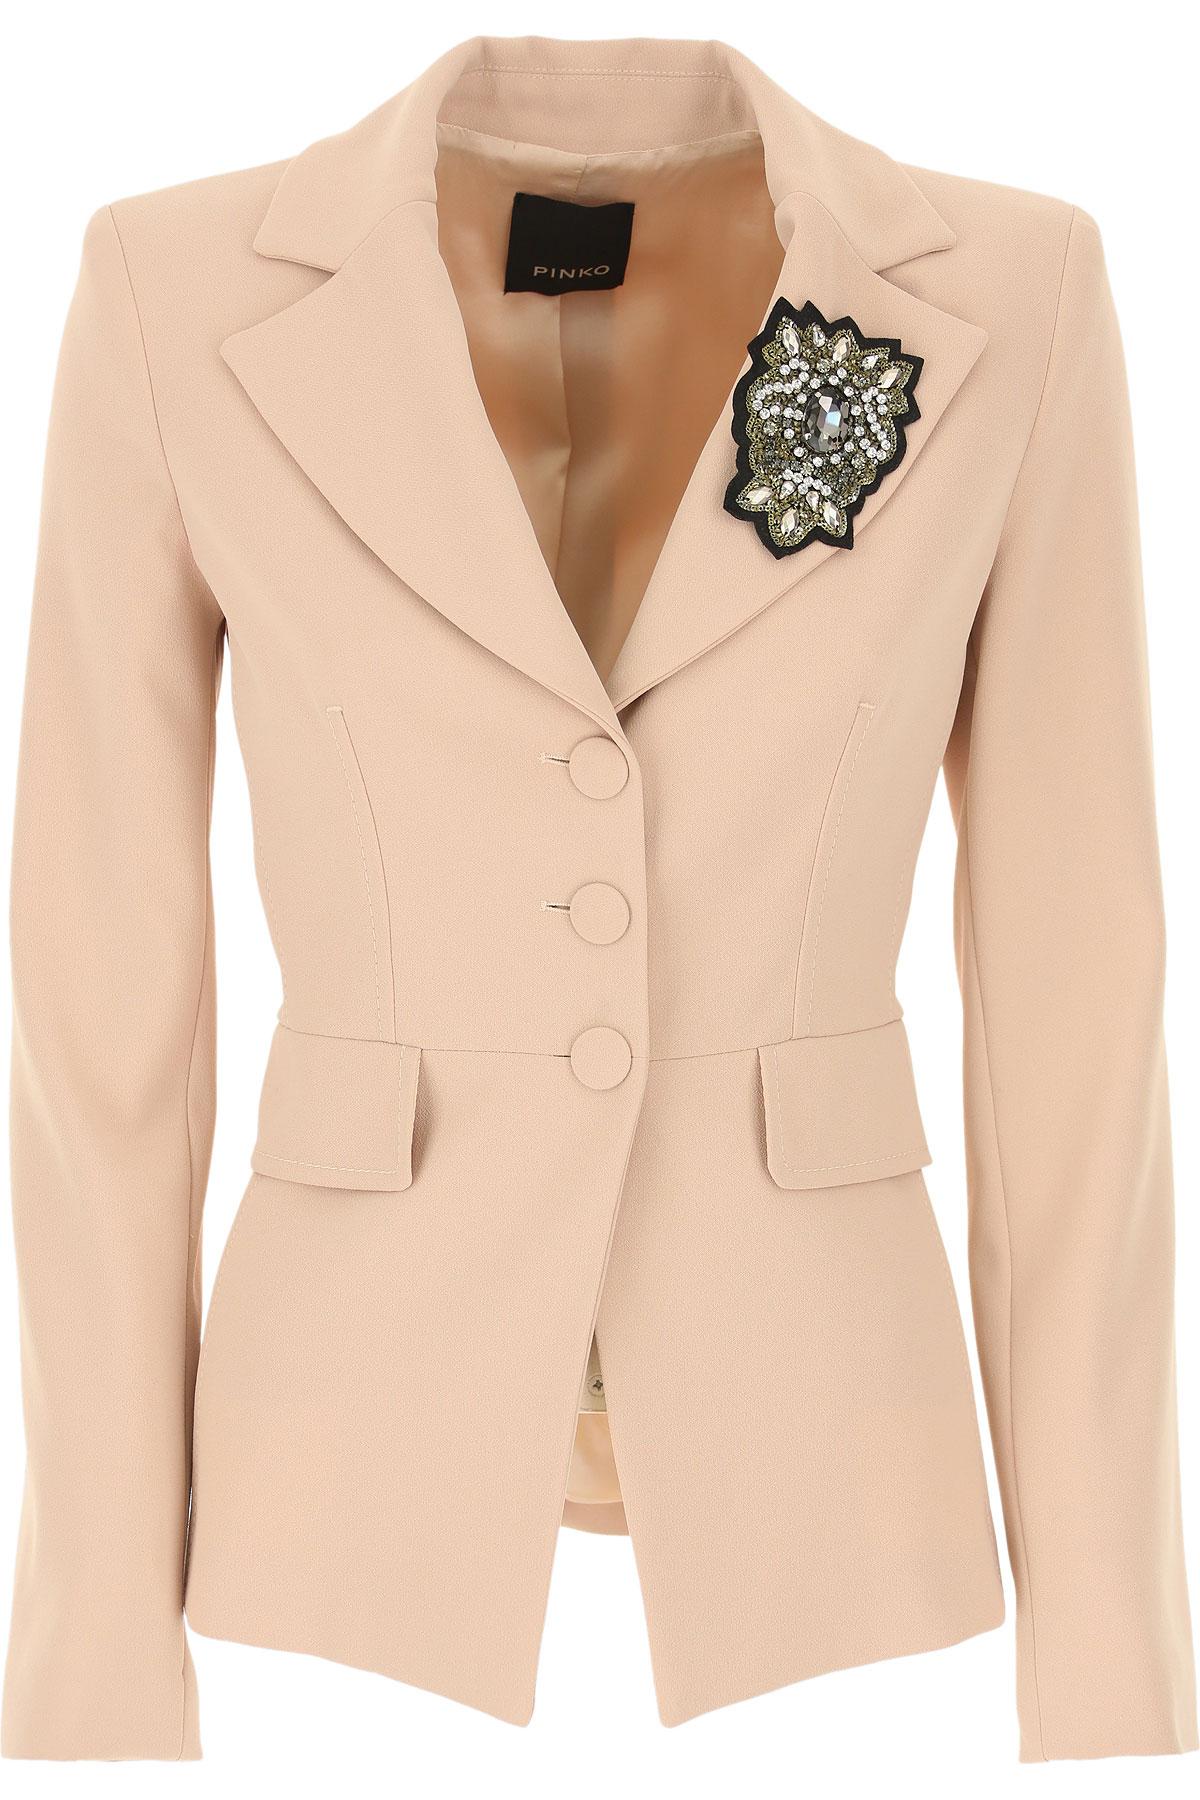 Pinko Blazer for Women On Sale, Dusty Pink, polyester, 2019, 4 6 8